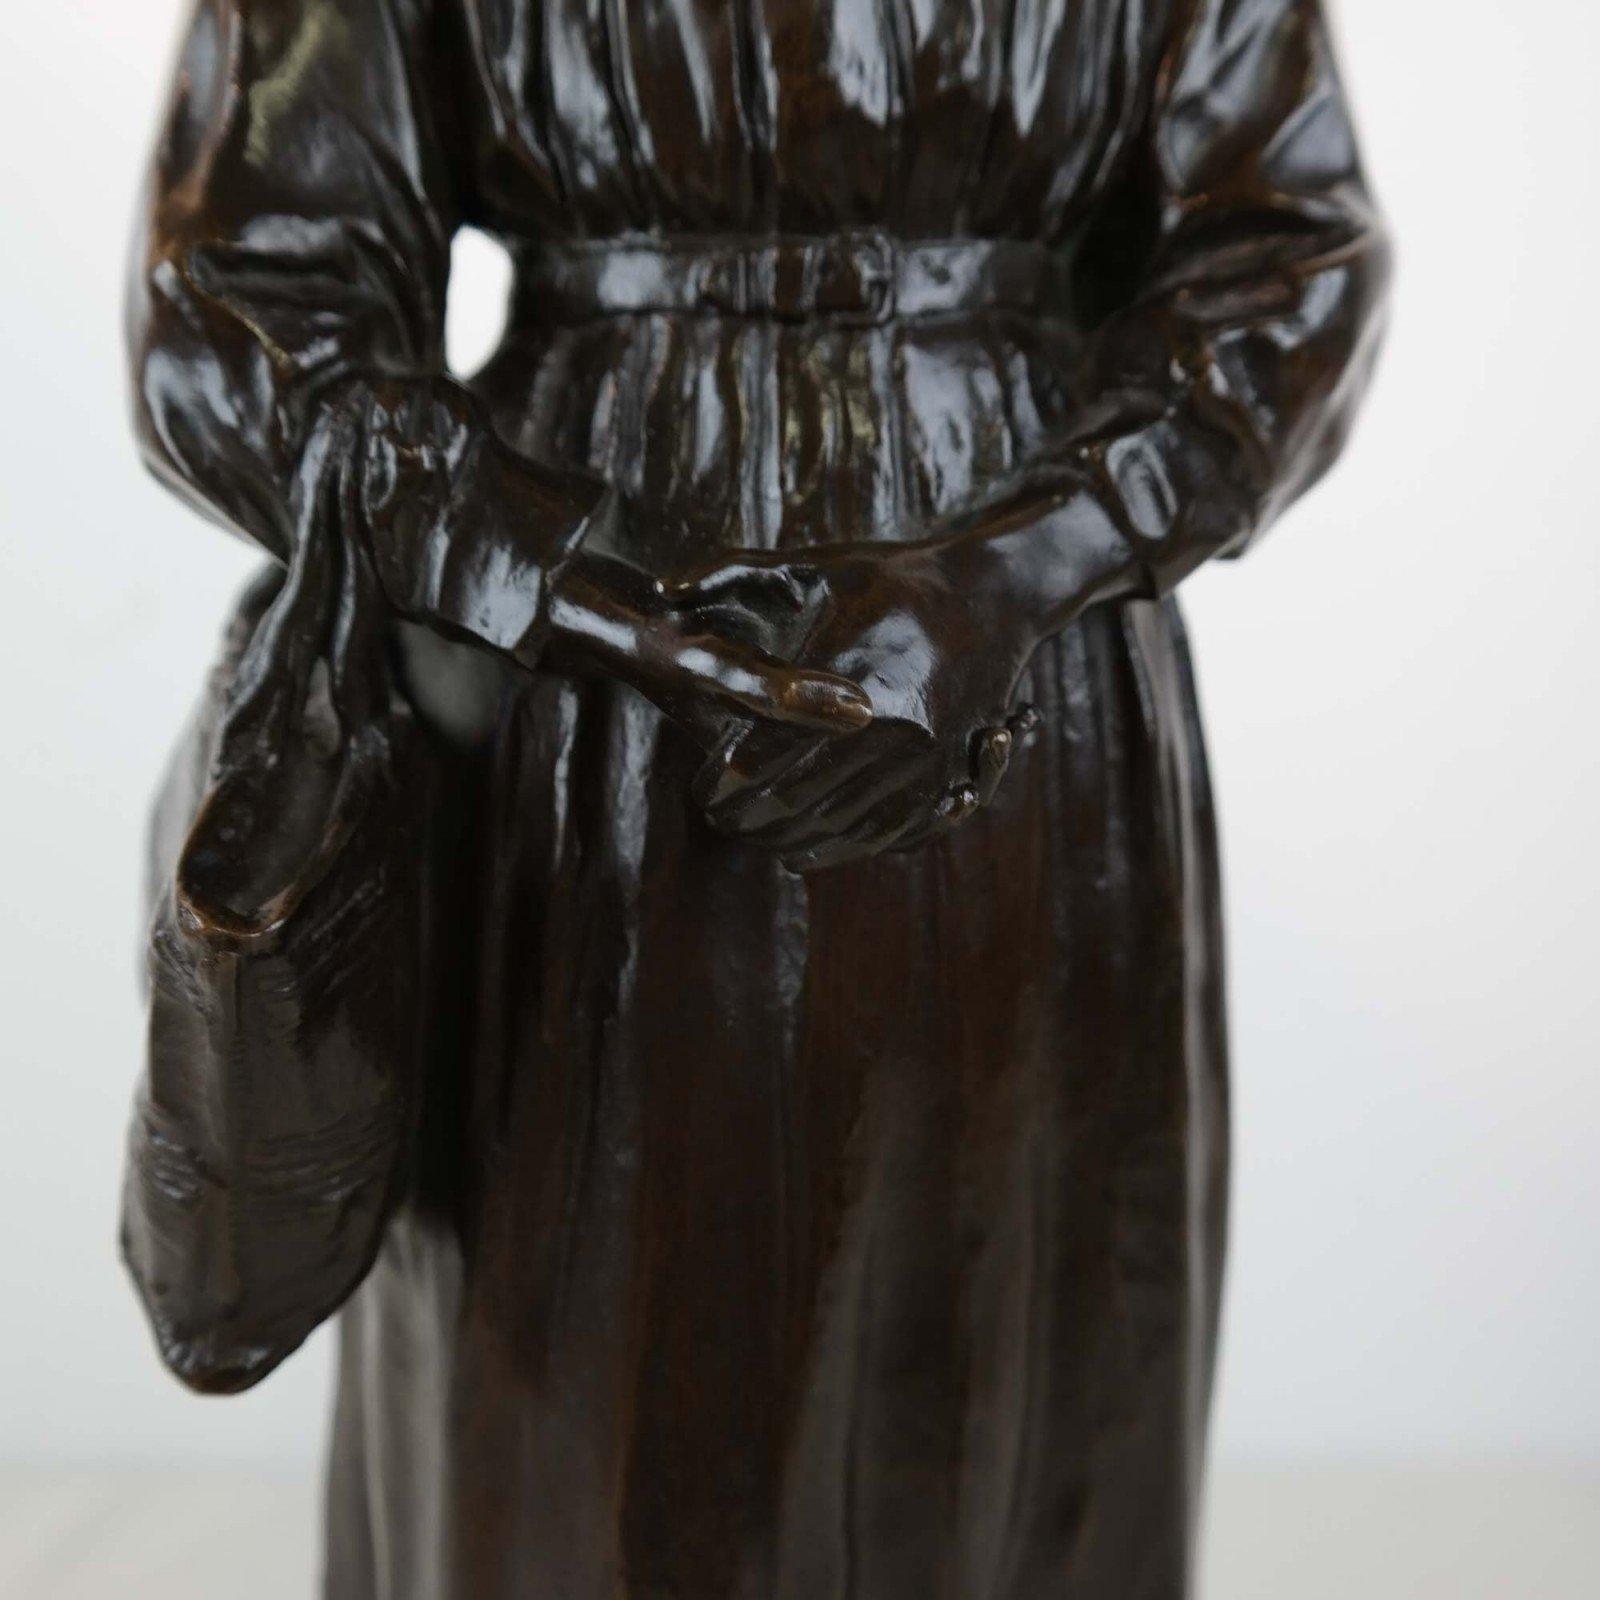 Jean-Baptiste de Keyser (1857-1927)